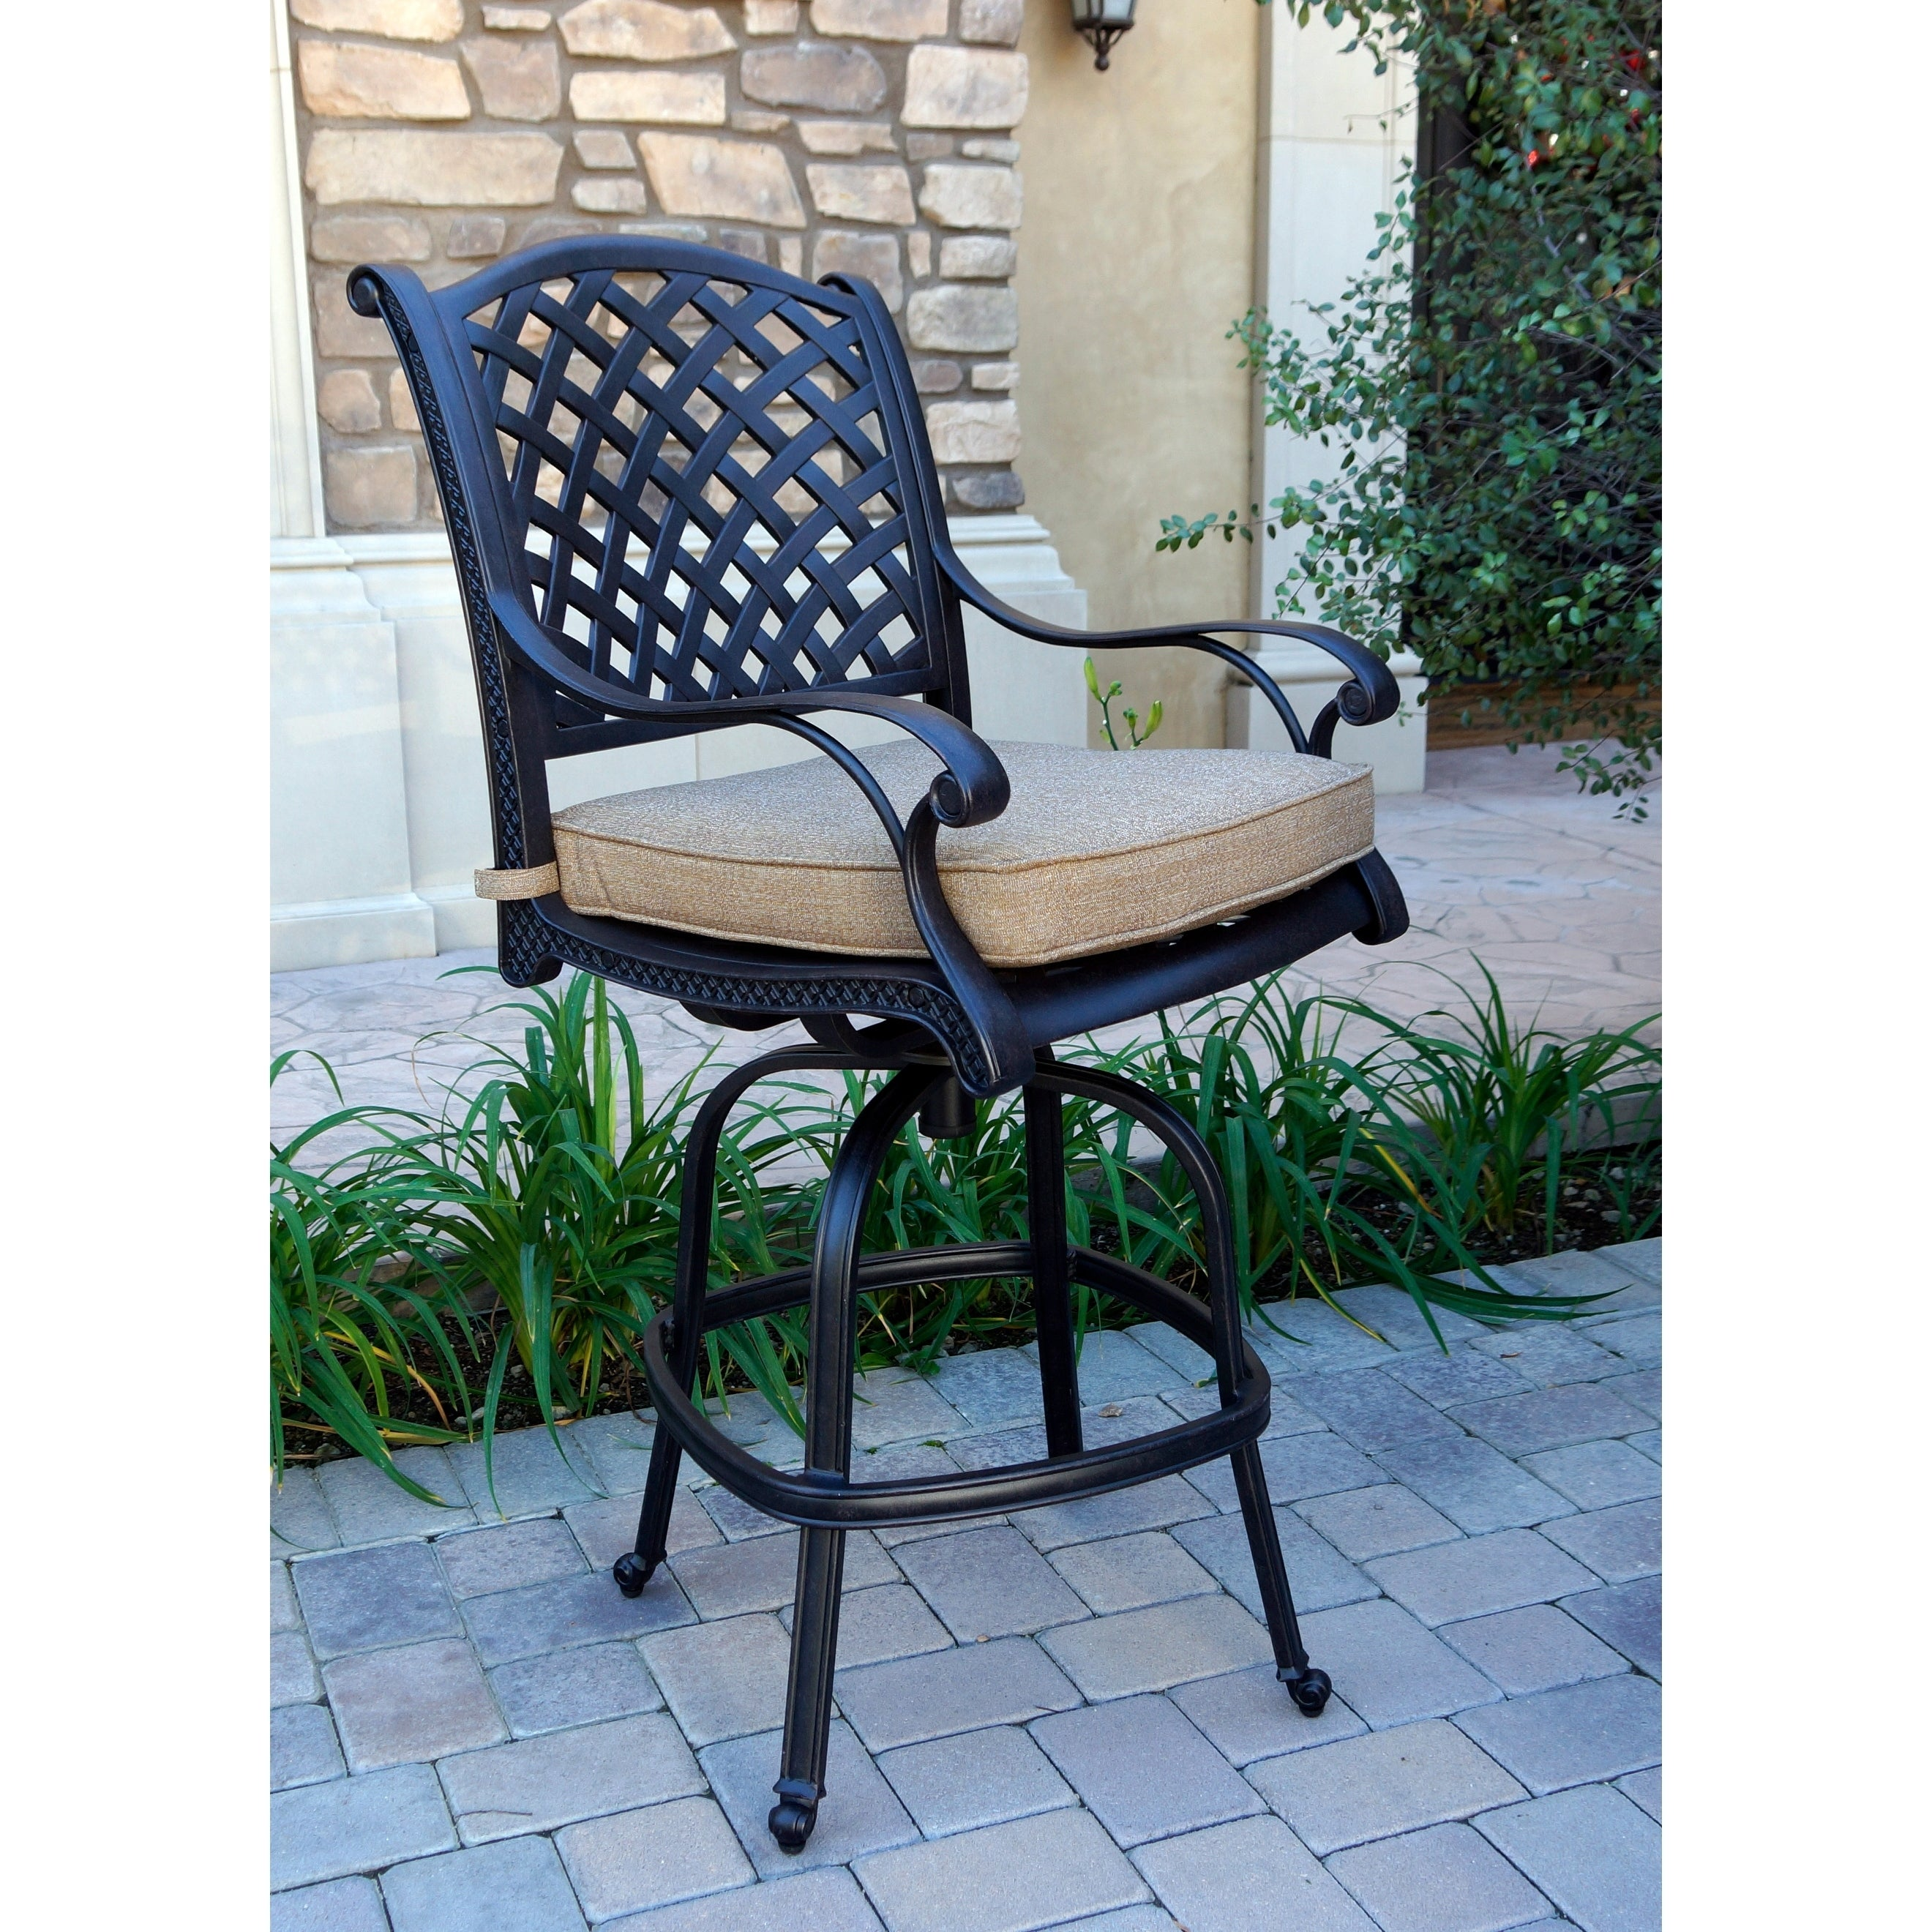 Image of: Shop Nassau Patio Swivel Bar Stool With Cushion Set Of 6 Overstock 26453828